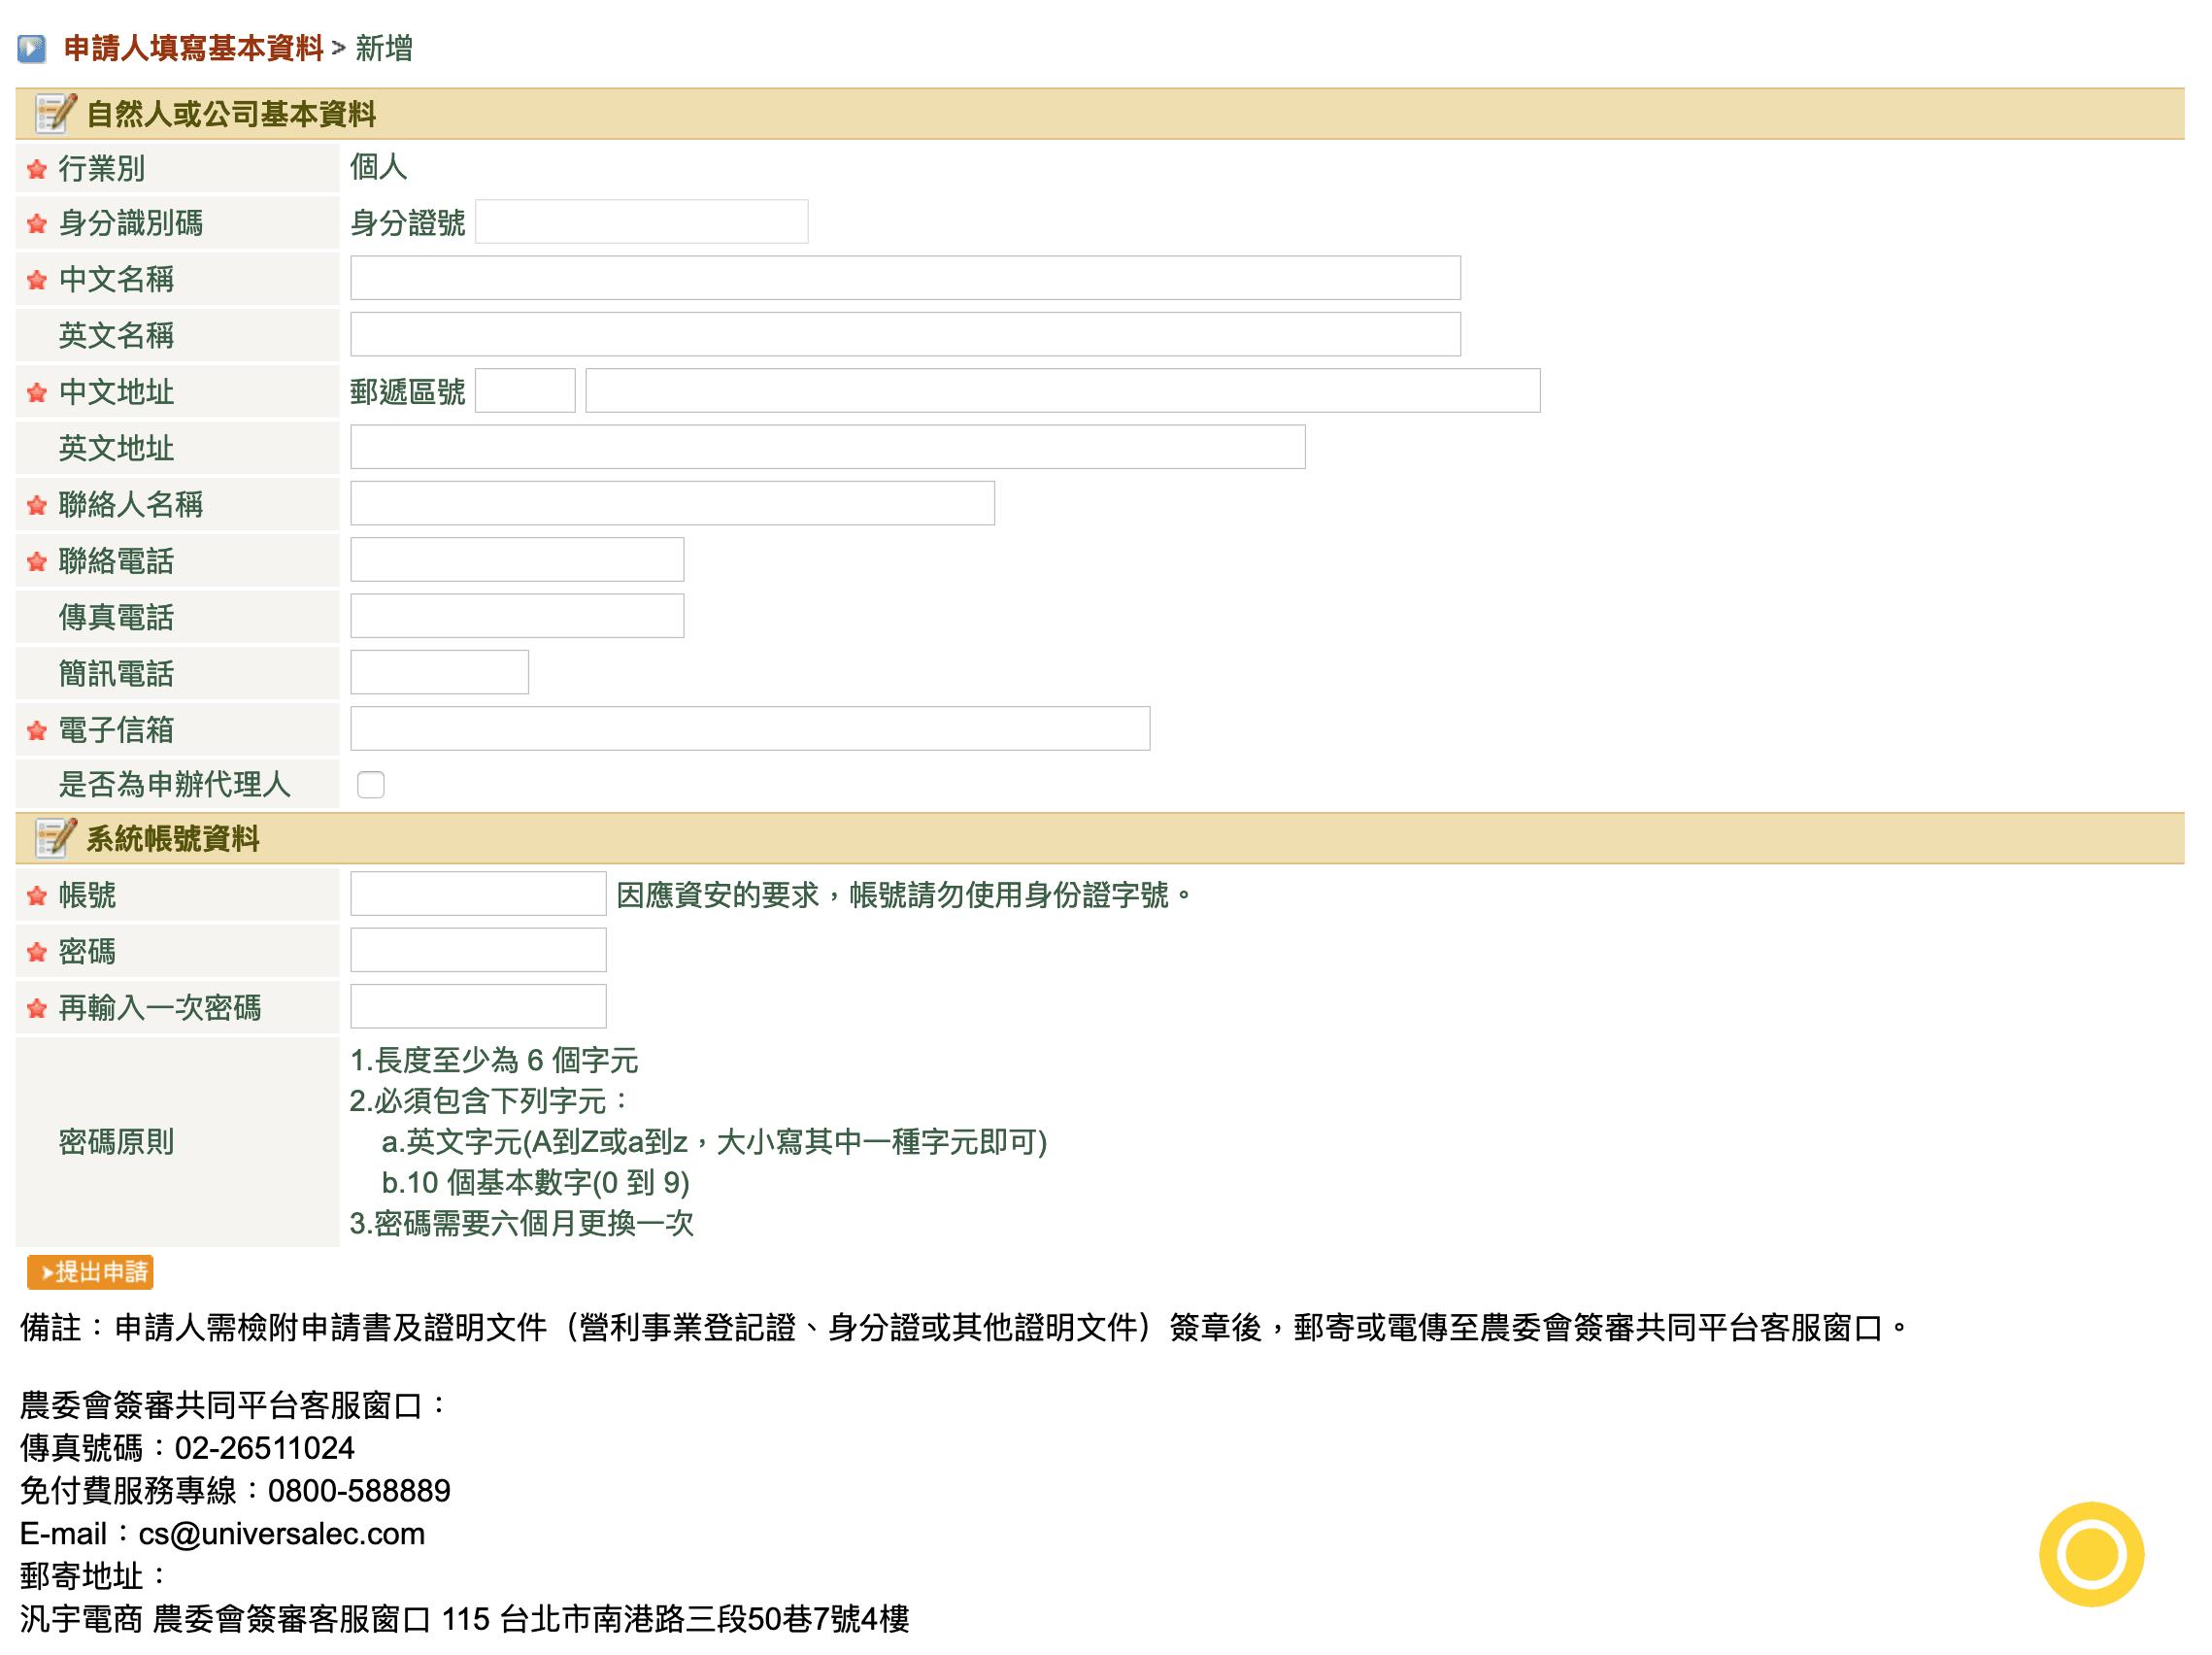 image 2 從日本攜帶白米回台灣的合法進口與通關申請